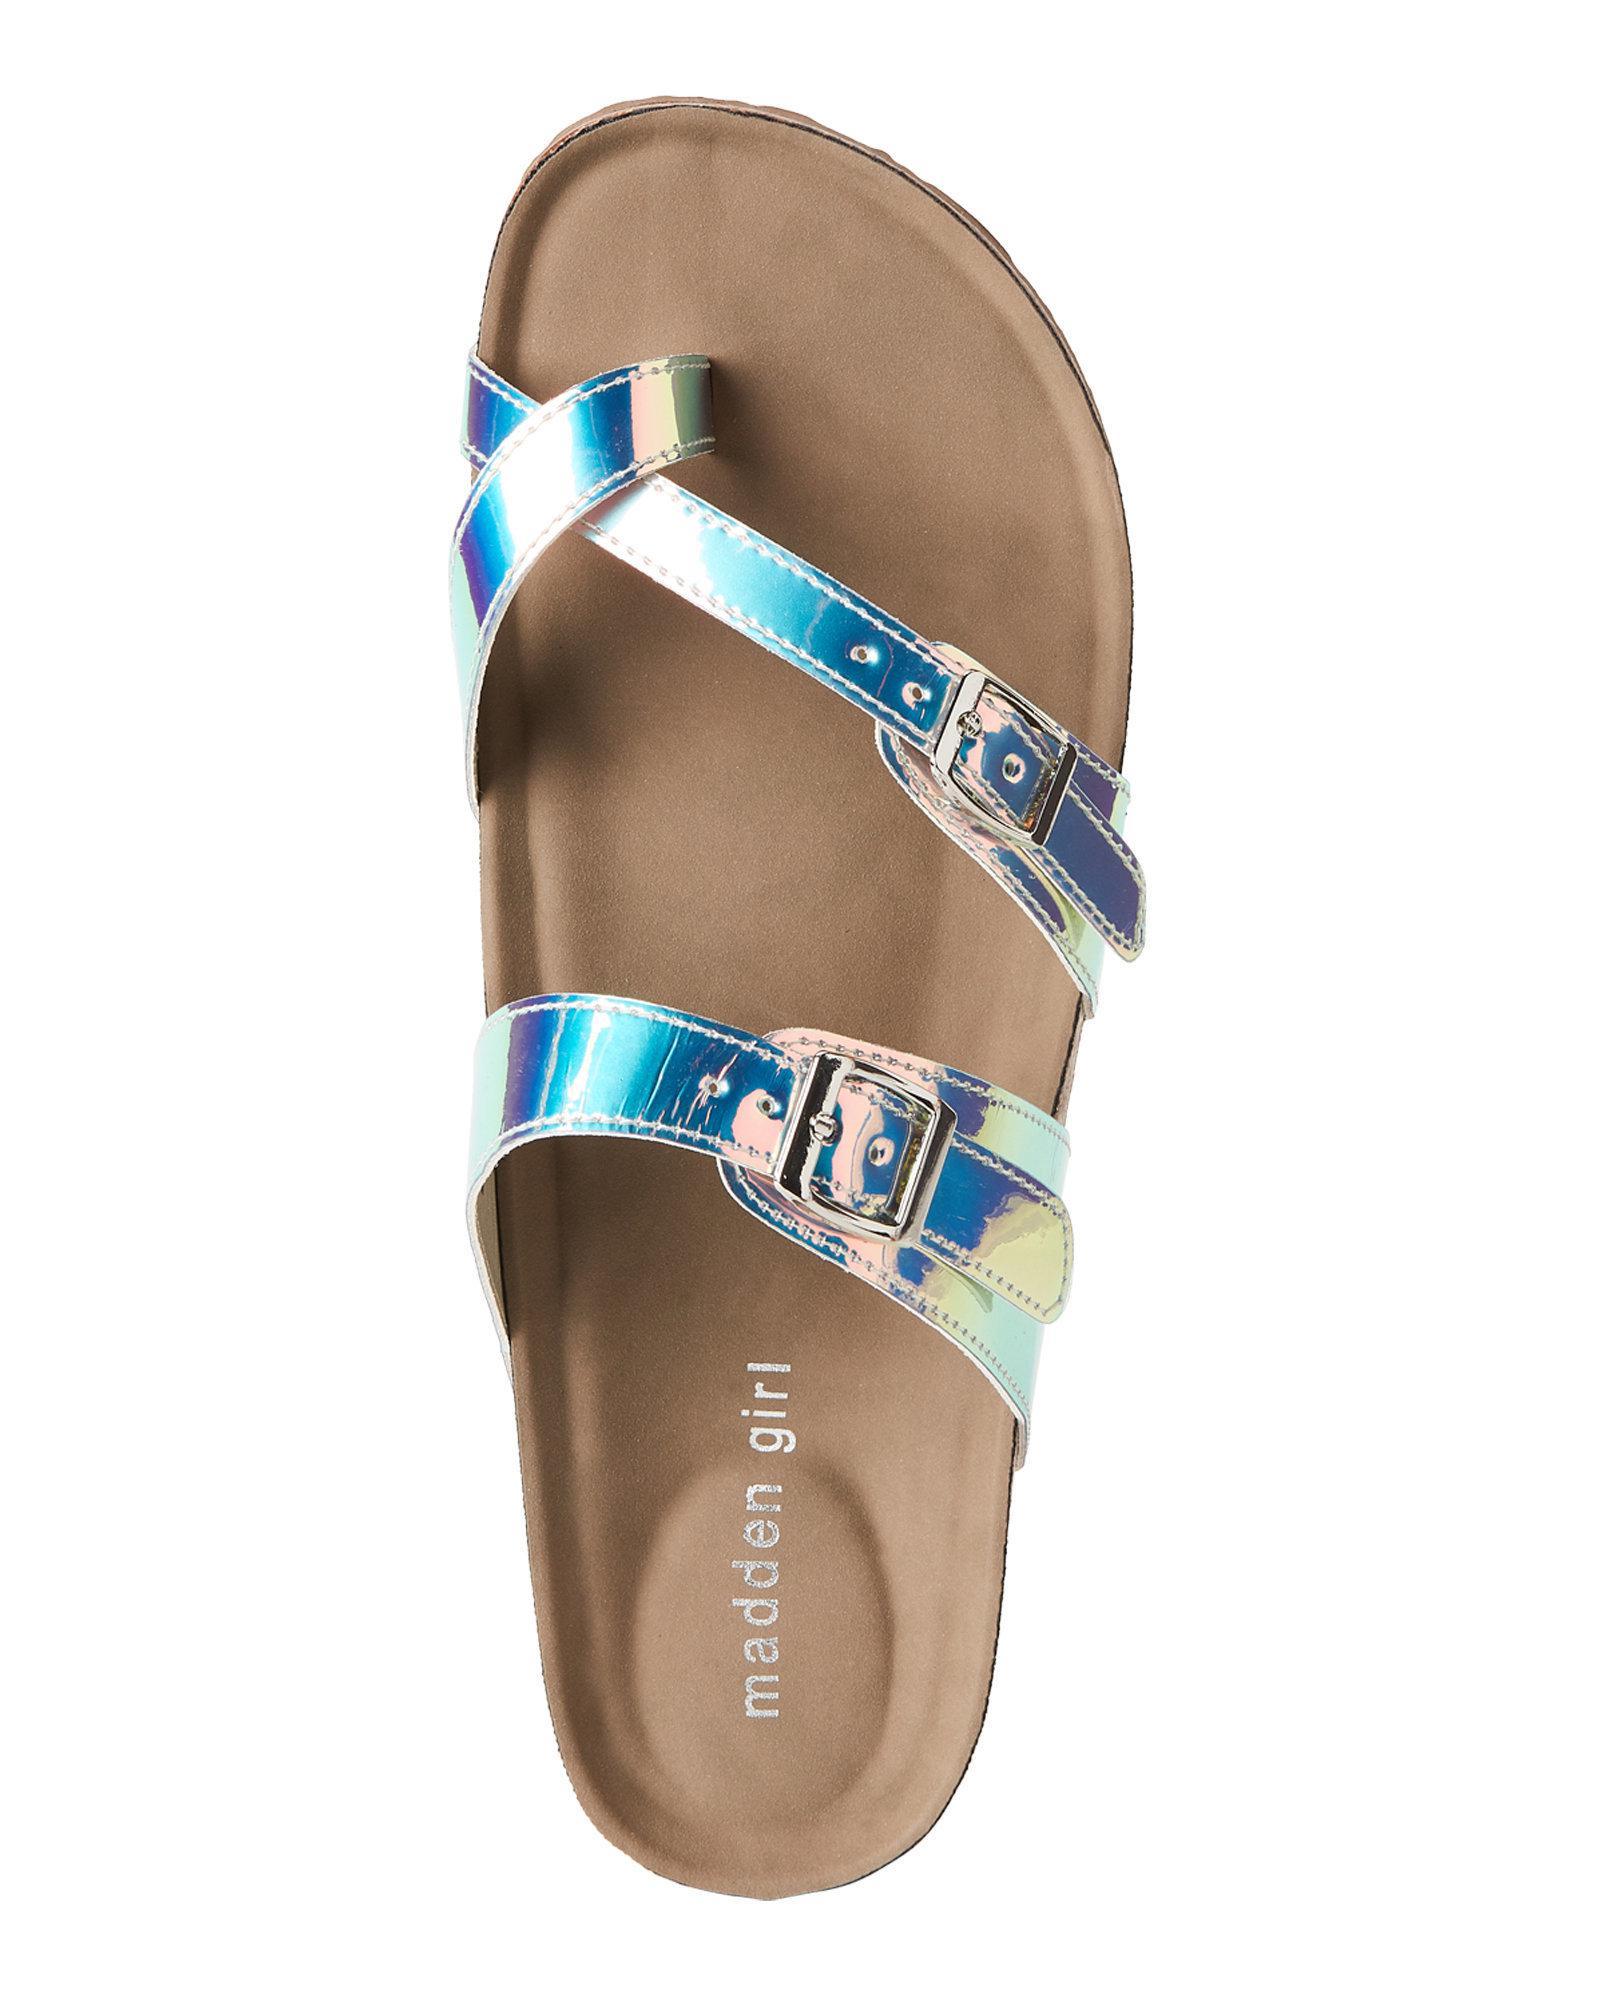 6e96e291d140 Lyst - Madden Girl Iridescent Bryceee Footbed Sandals